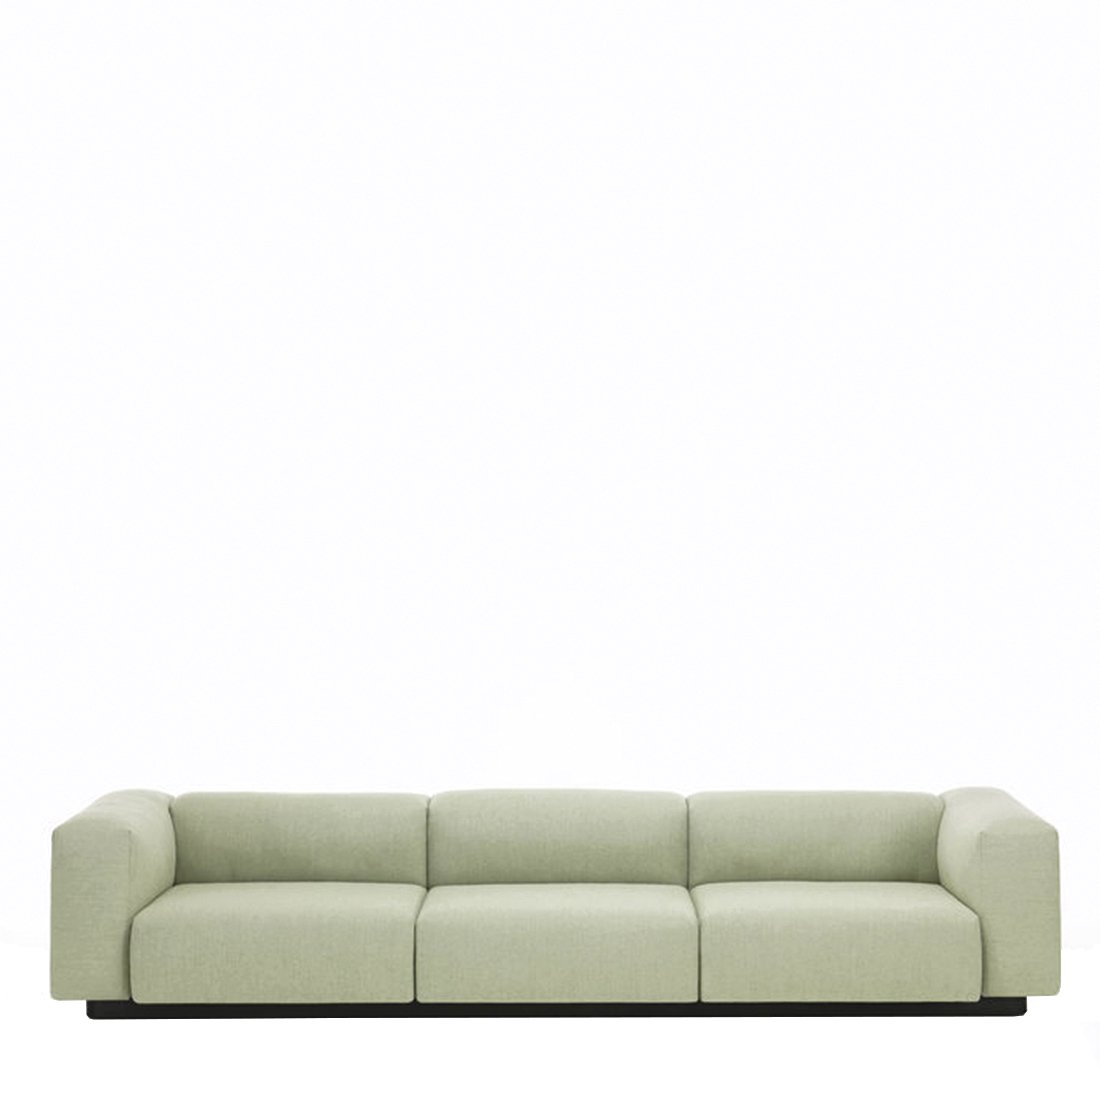 Vitra Soft Modular Sofa 3-Zits Bank Dumet 15